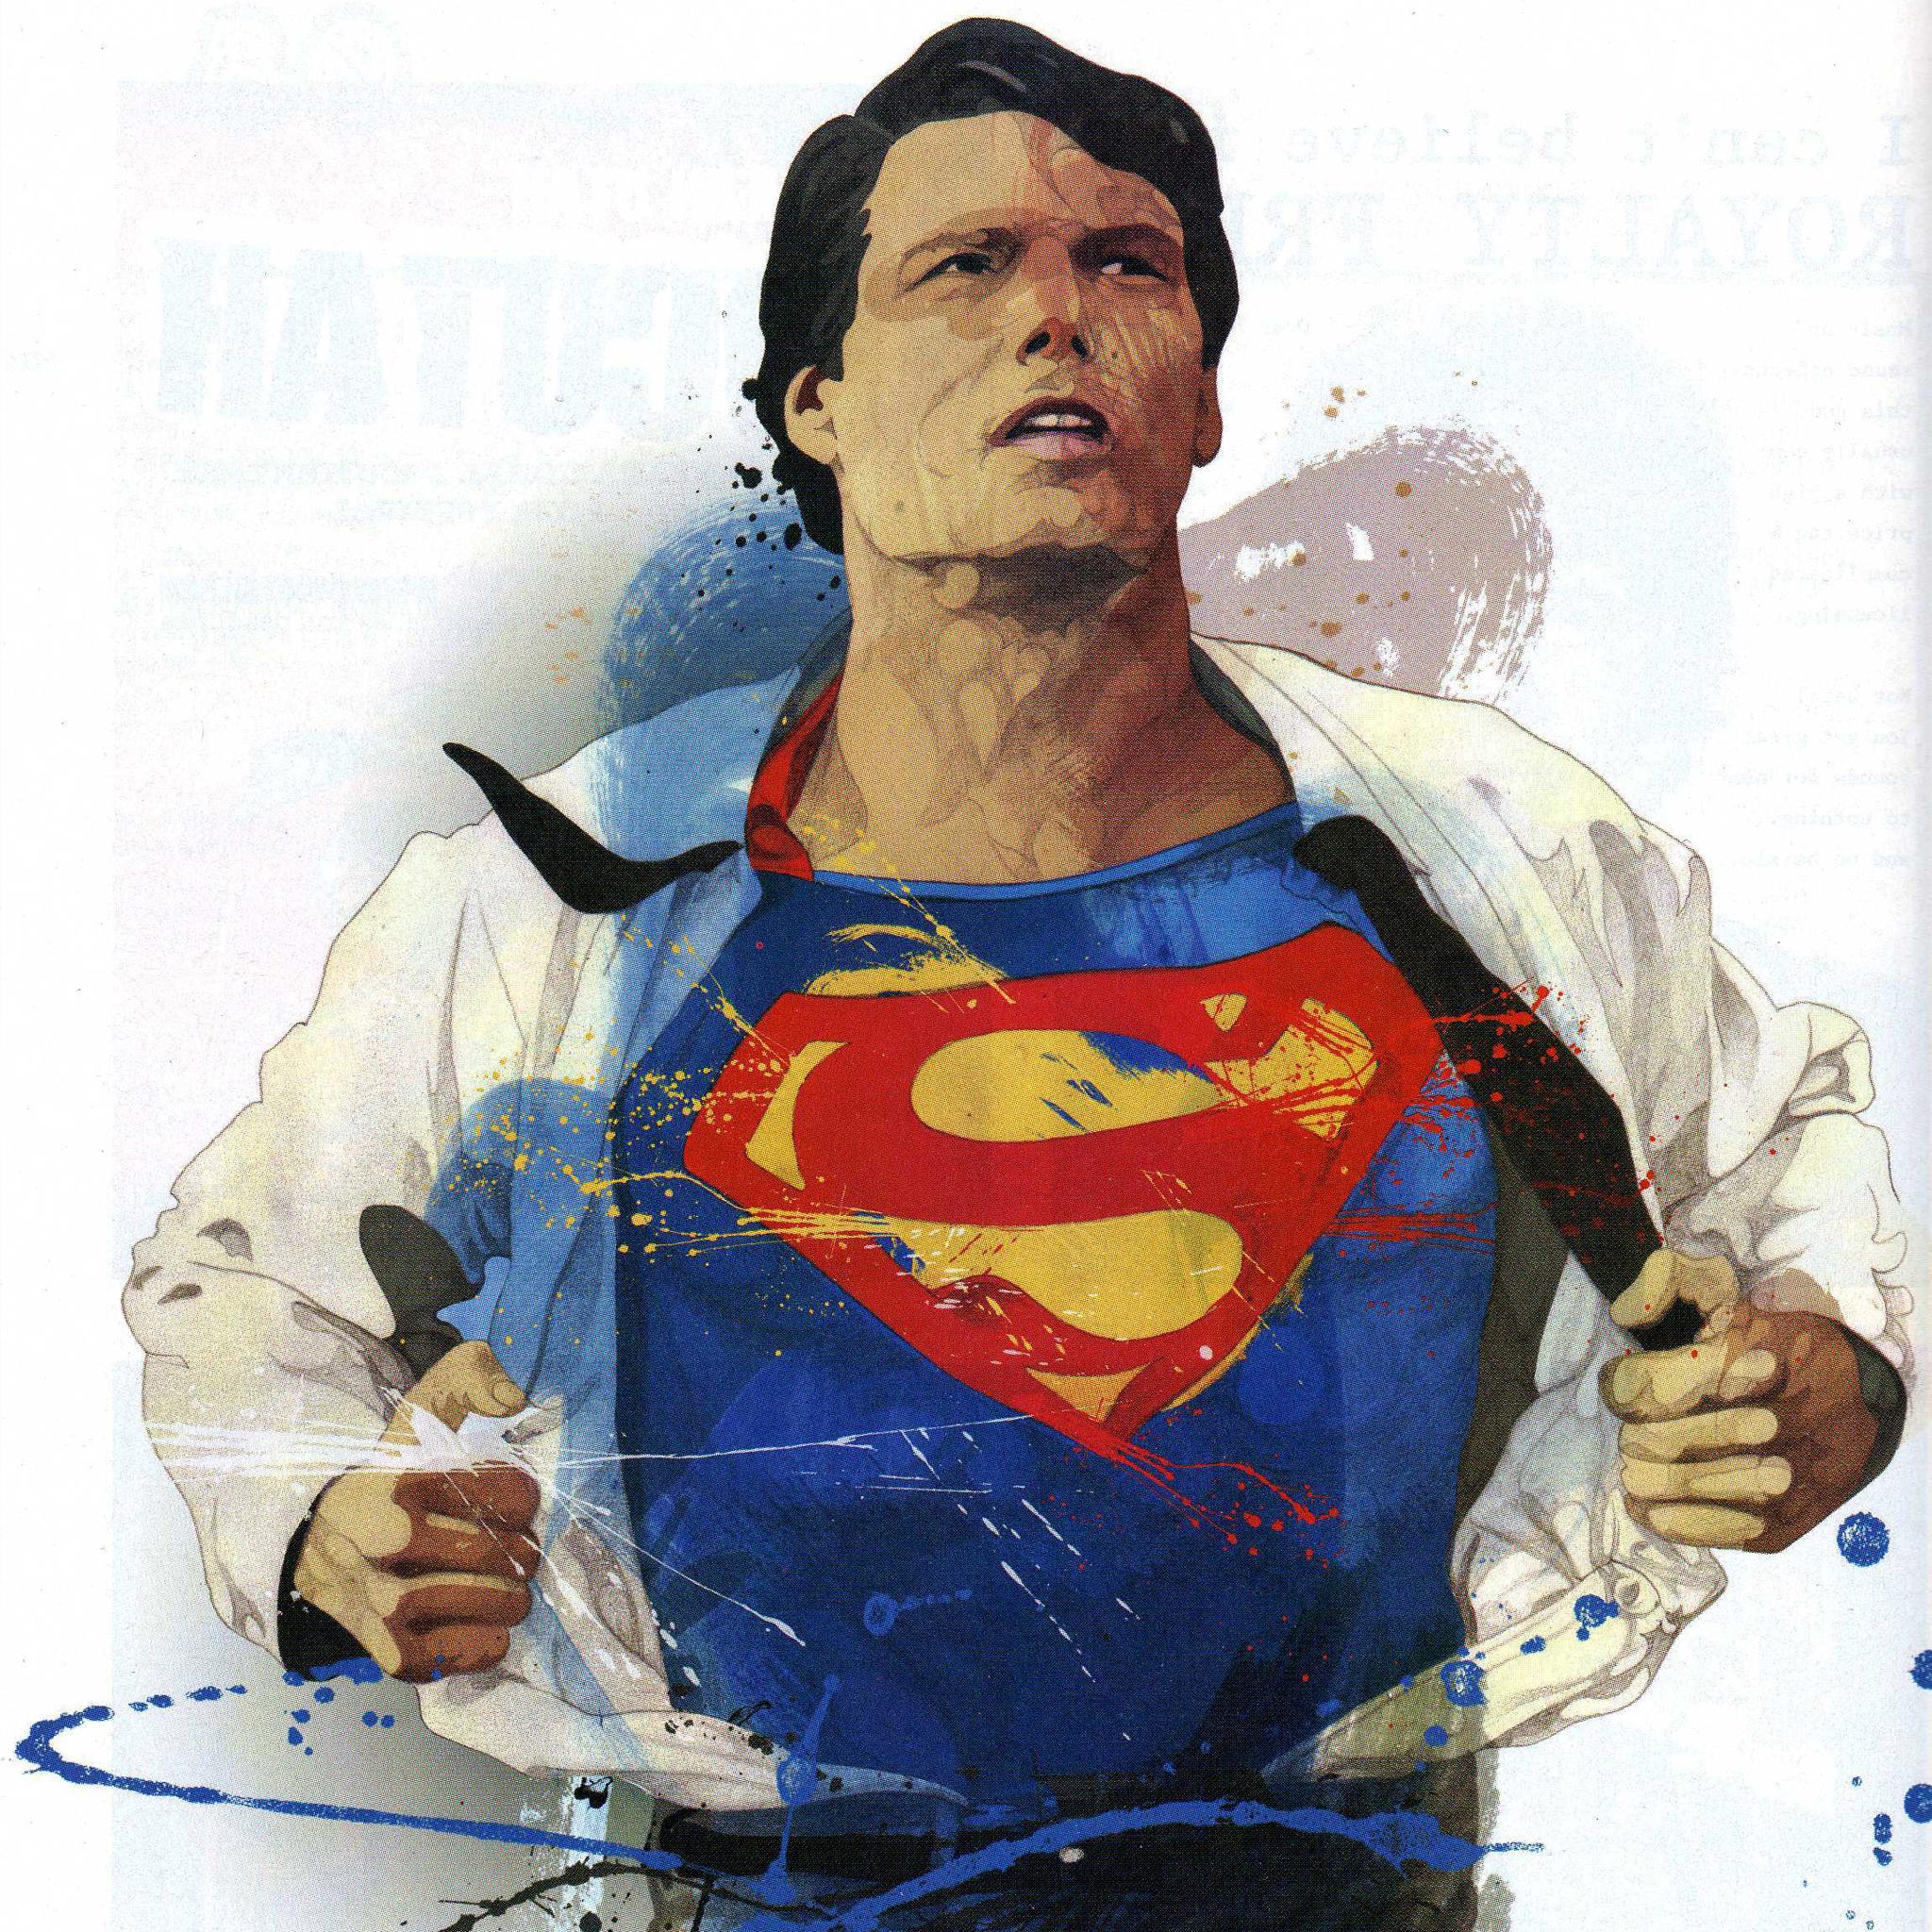 Reeve as Superman 3Wallpapers iPad Reeve as Superman   iPad